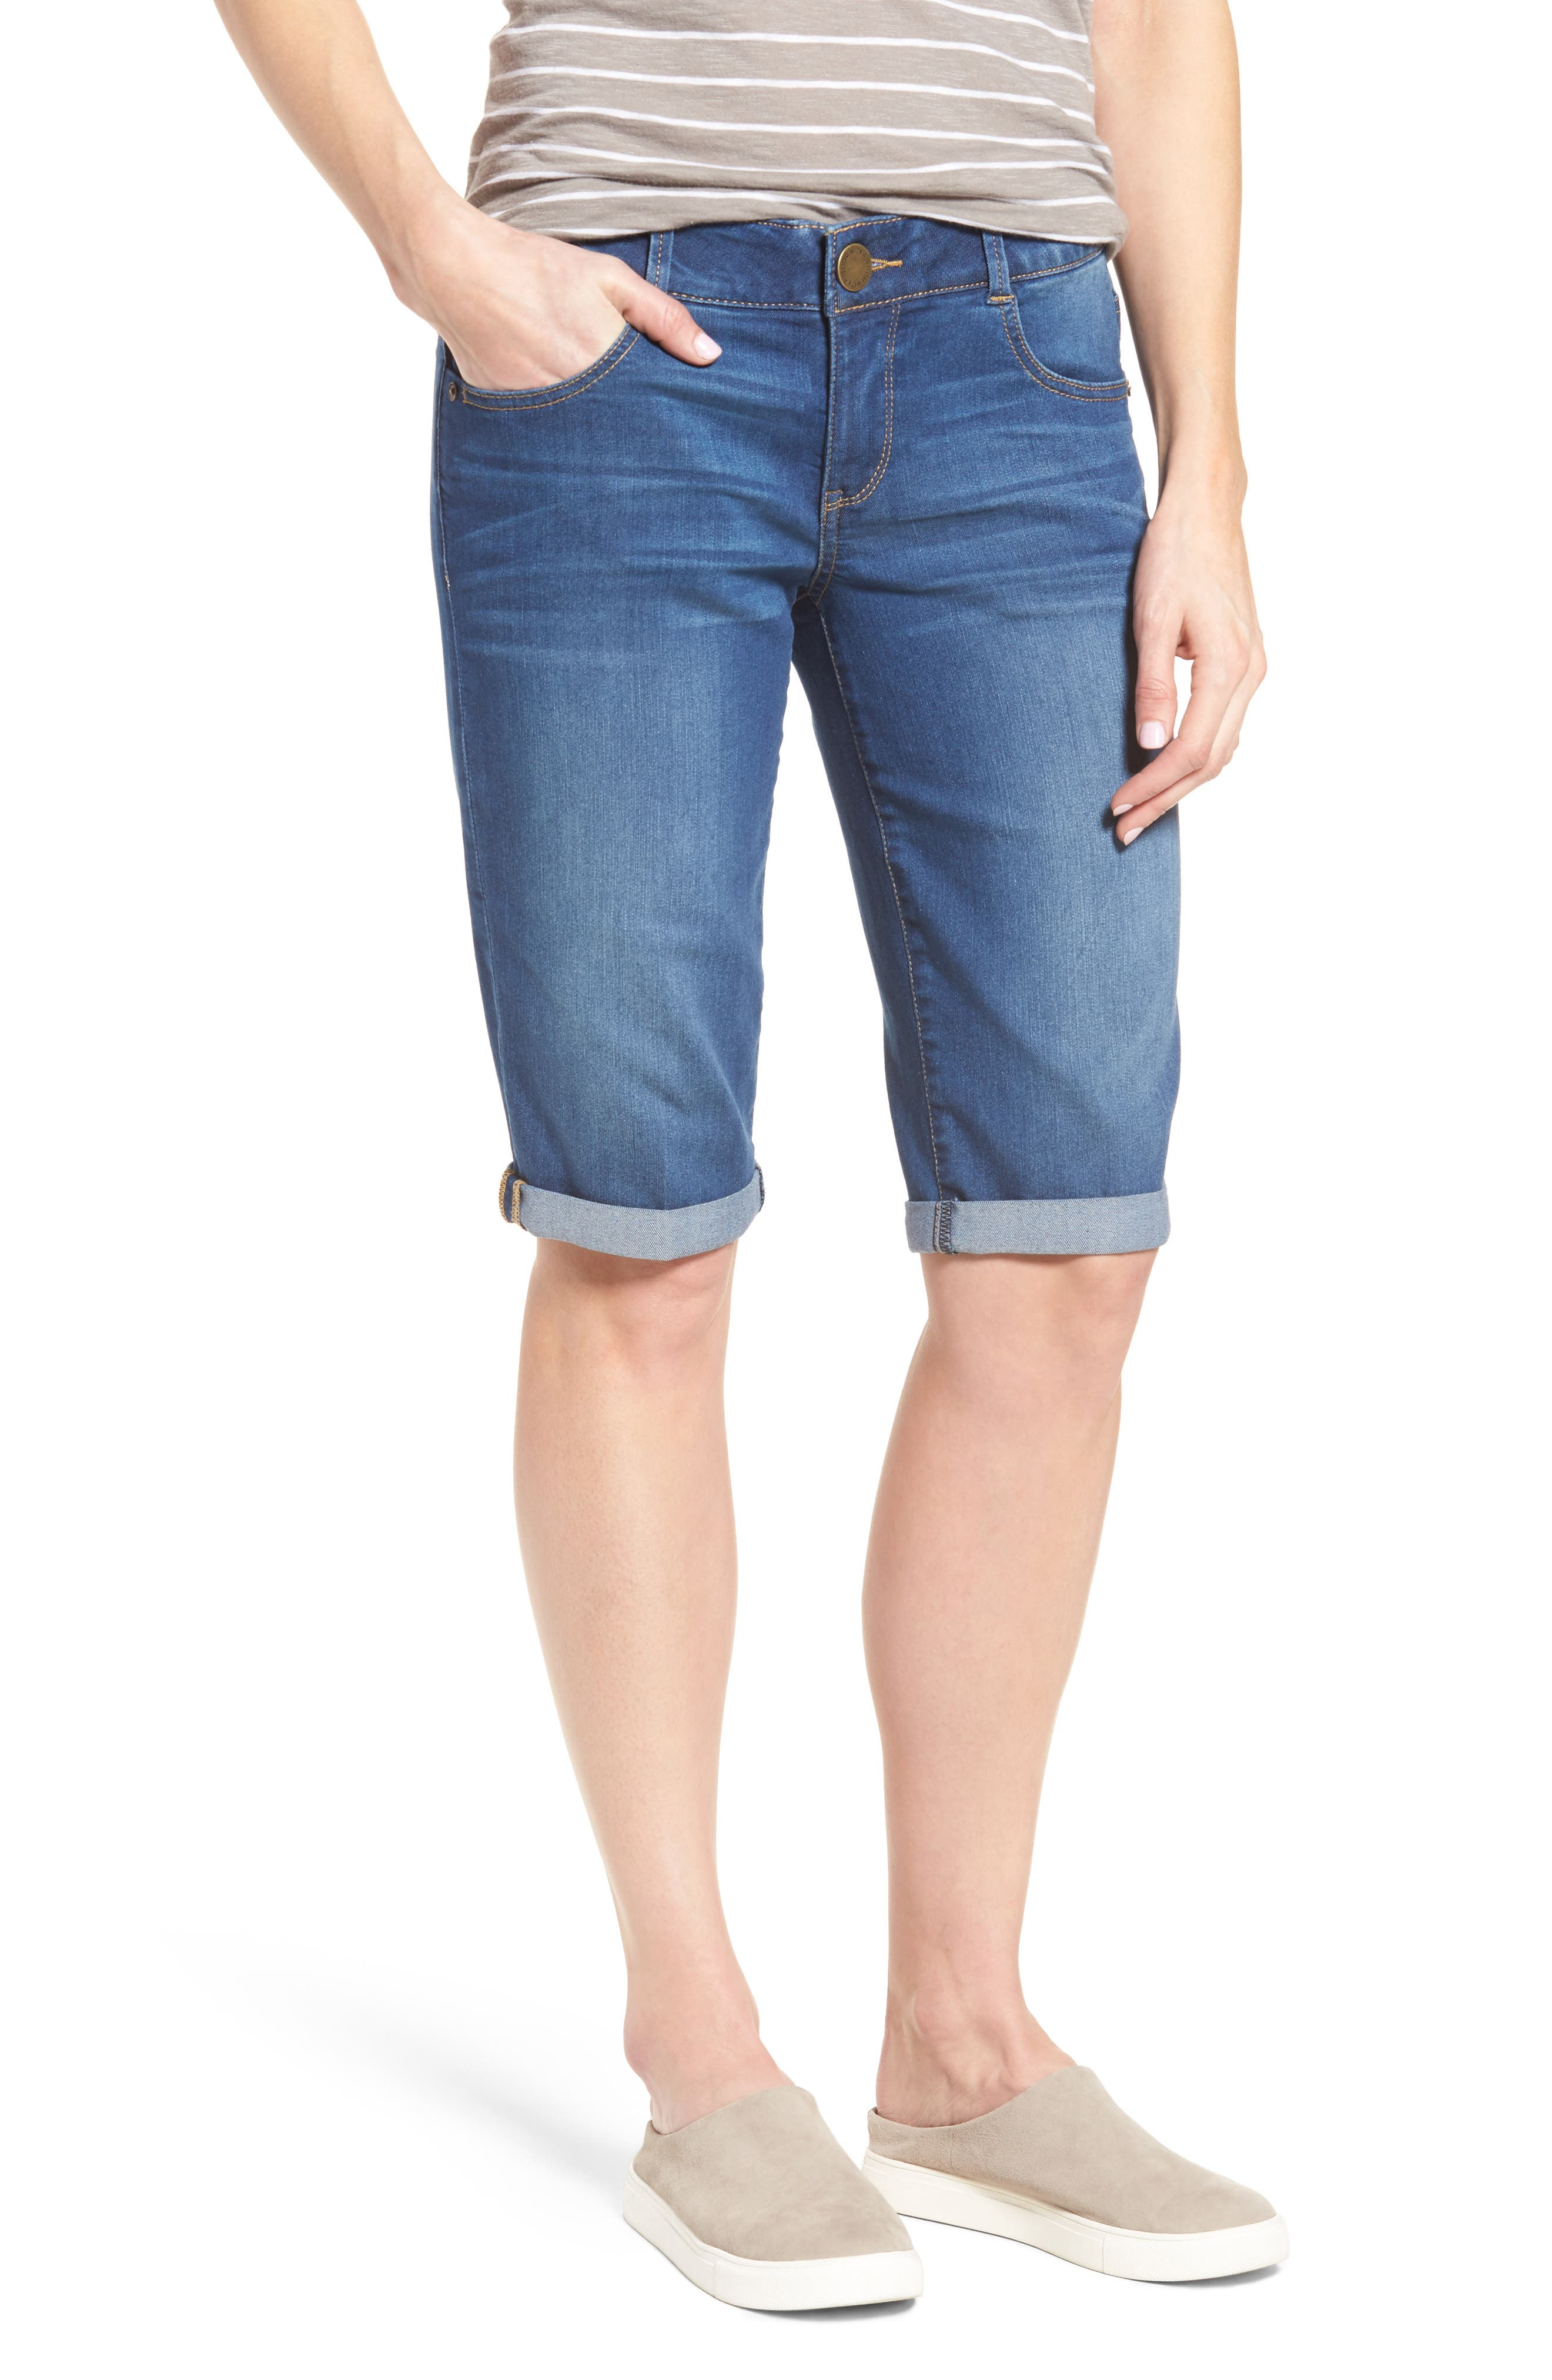 Main Image - Wit & Wisdom Ab-solution Denim Bermuda Shorts (Nordstrom Exclusive)